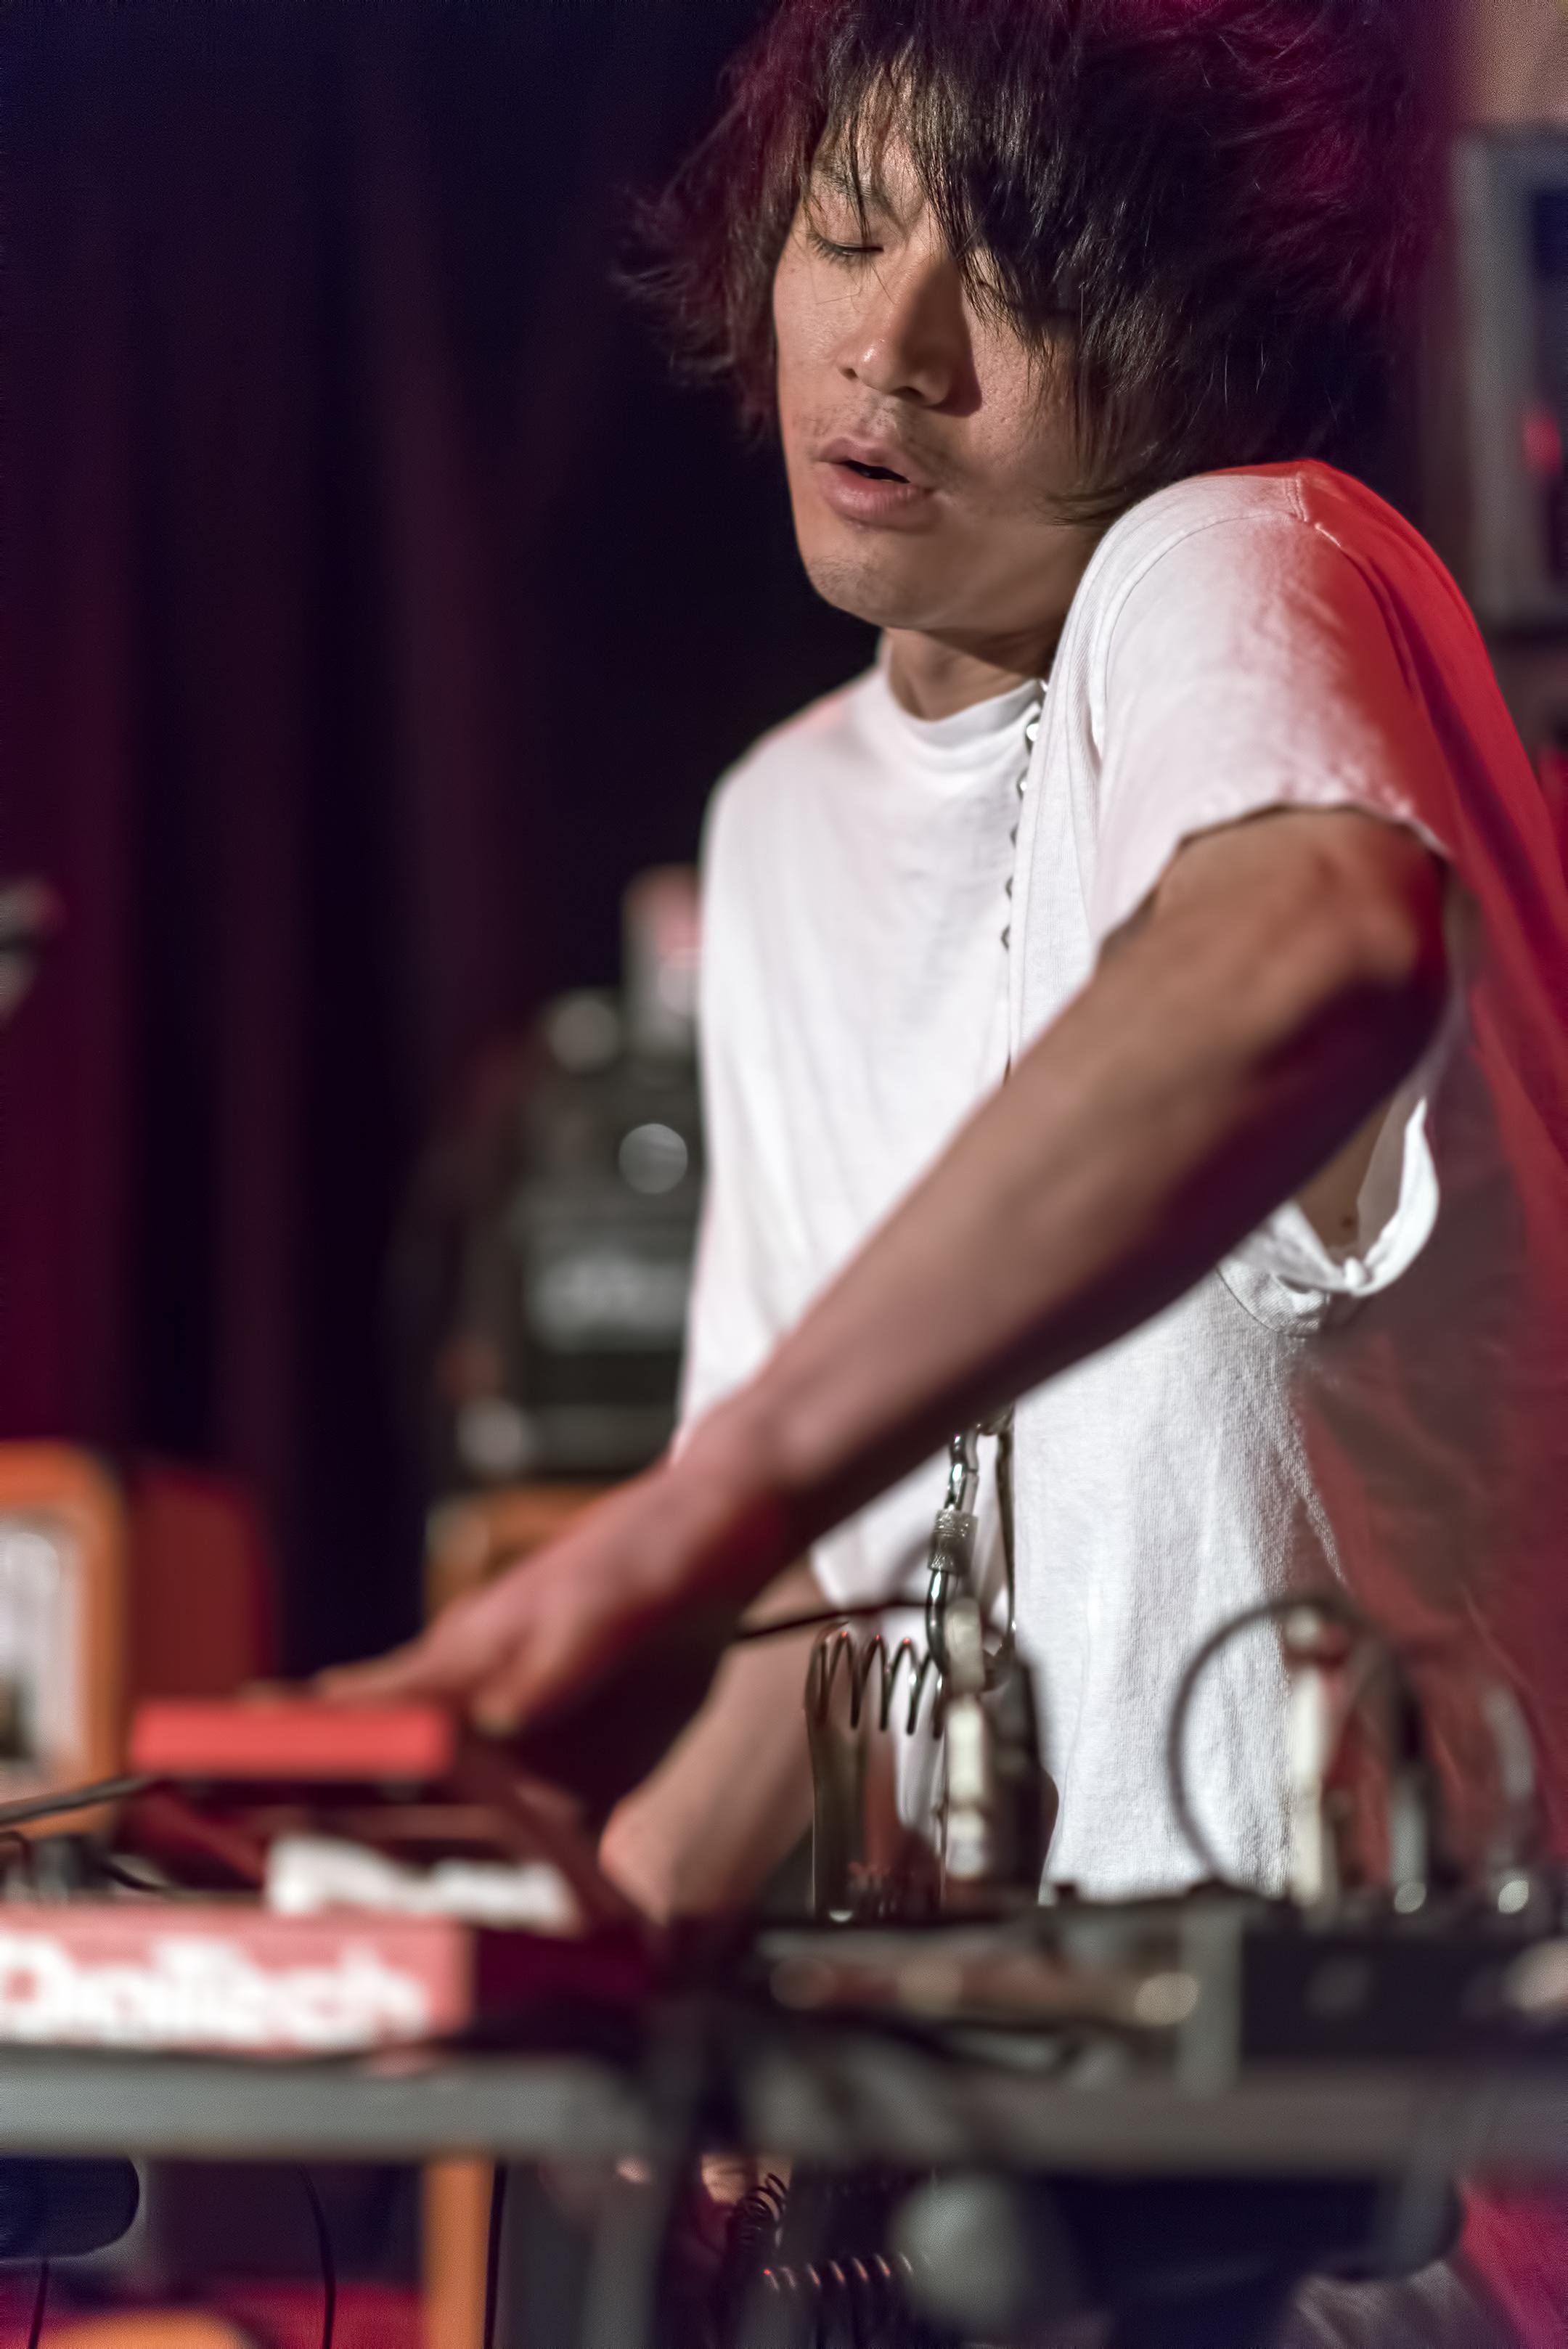 Etsuo Nagura endon